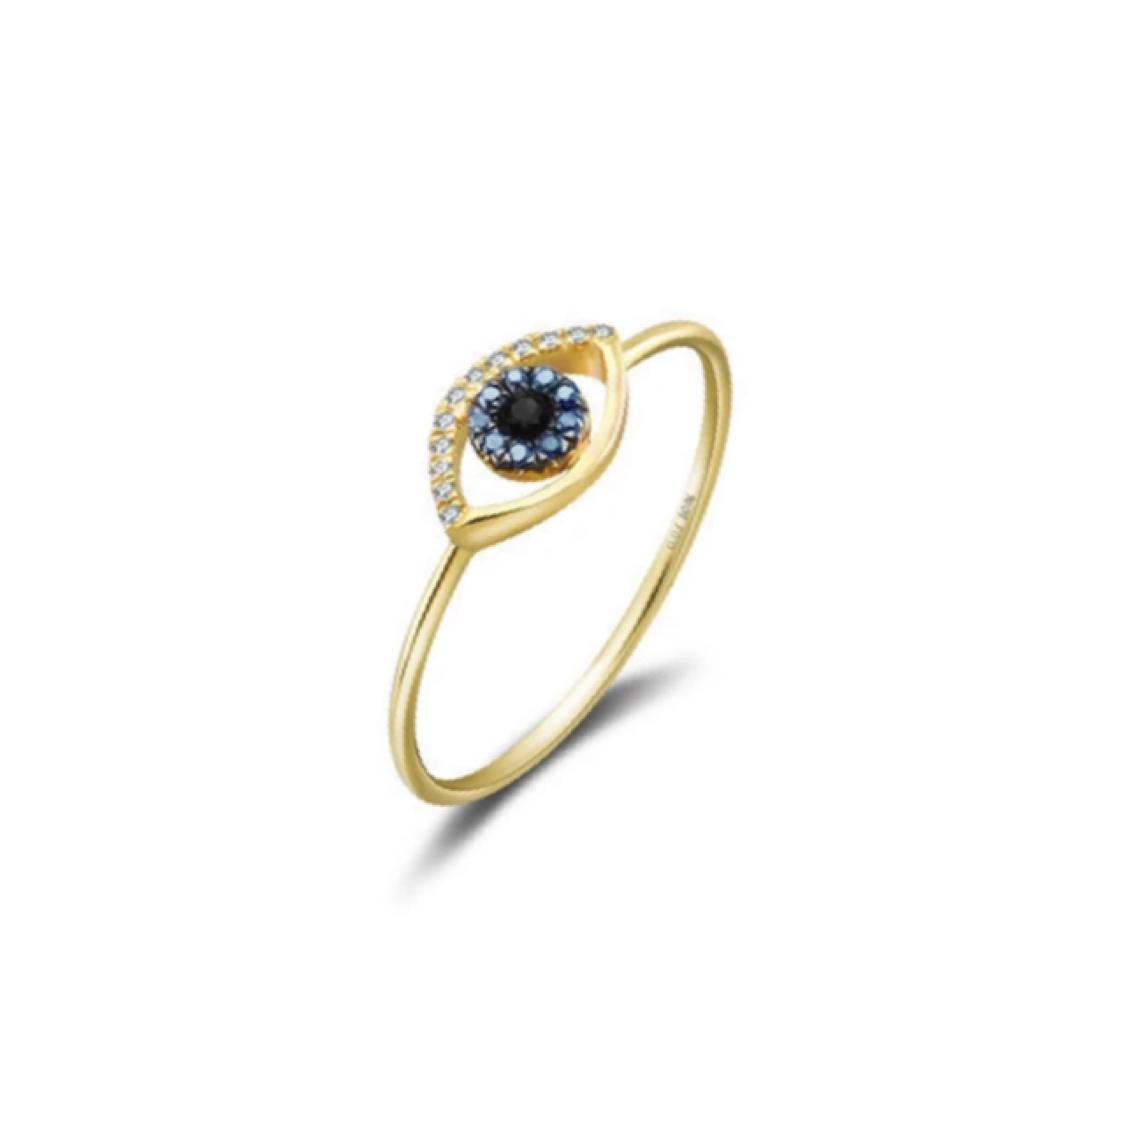 Anel Olho Grego Ouro 18k, Safiras e Diamantes